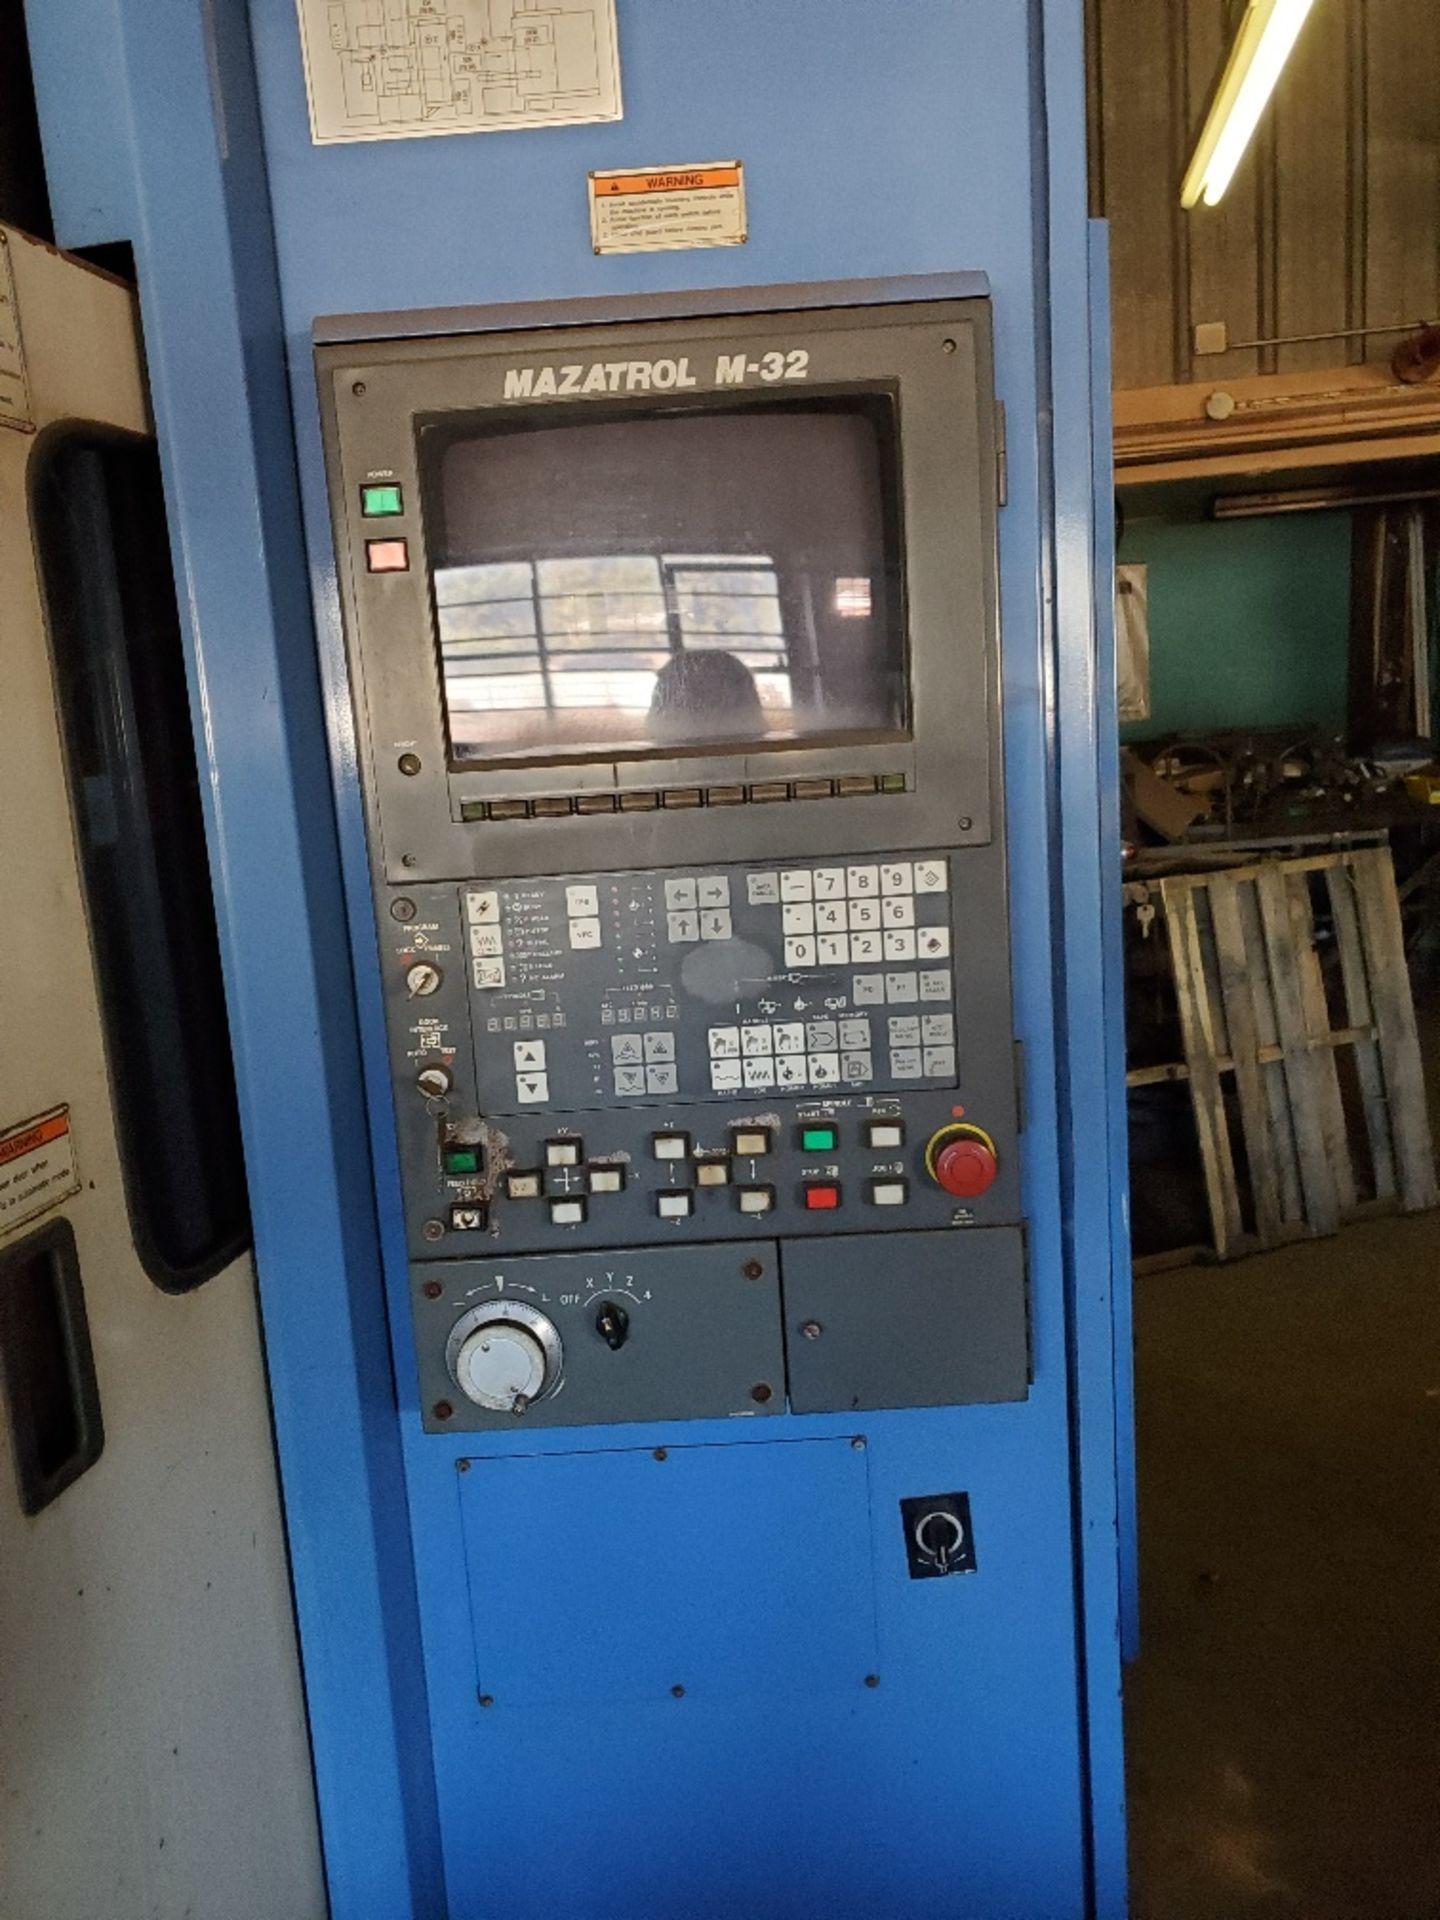 MAZAK AJV 25-405 MACHINING CENTER W/ MAZATROL M-32 CTRL (LOCATION: 5702 W 7TH ST, WAKE VILLLAGE, TX - Image 3 of 3